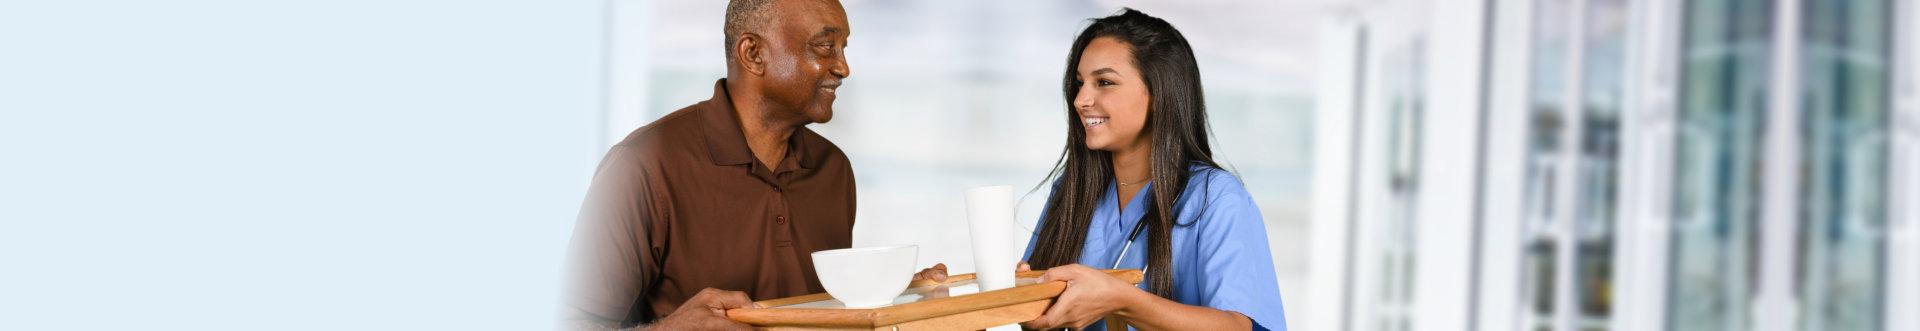 nurse serving food to old man